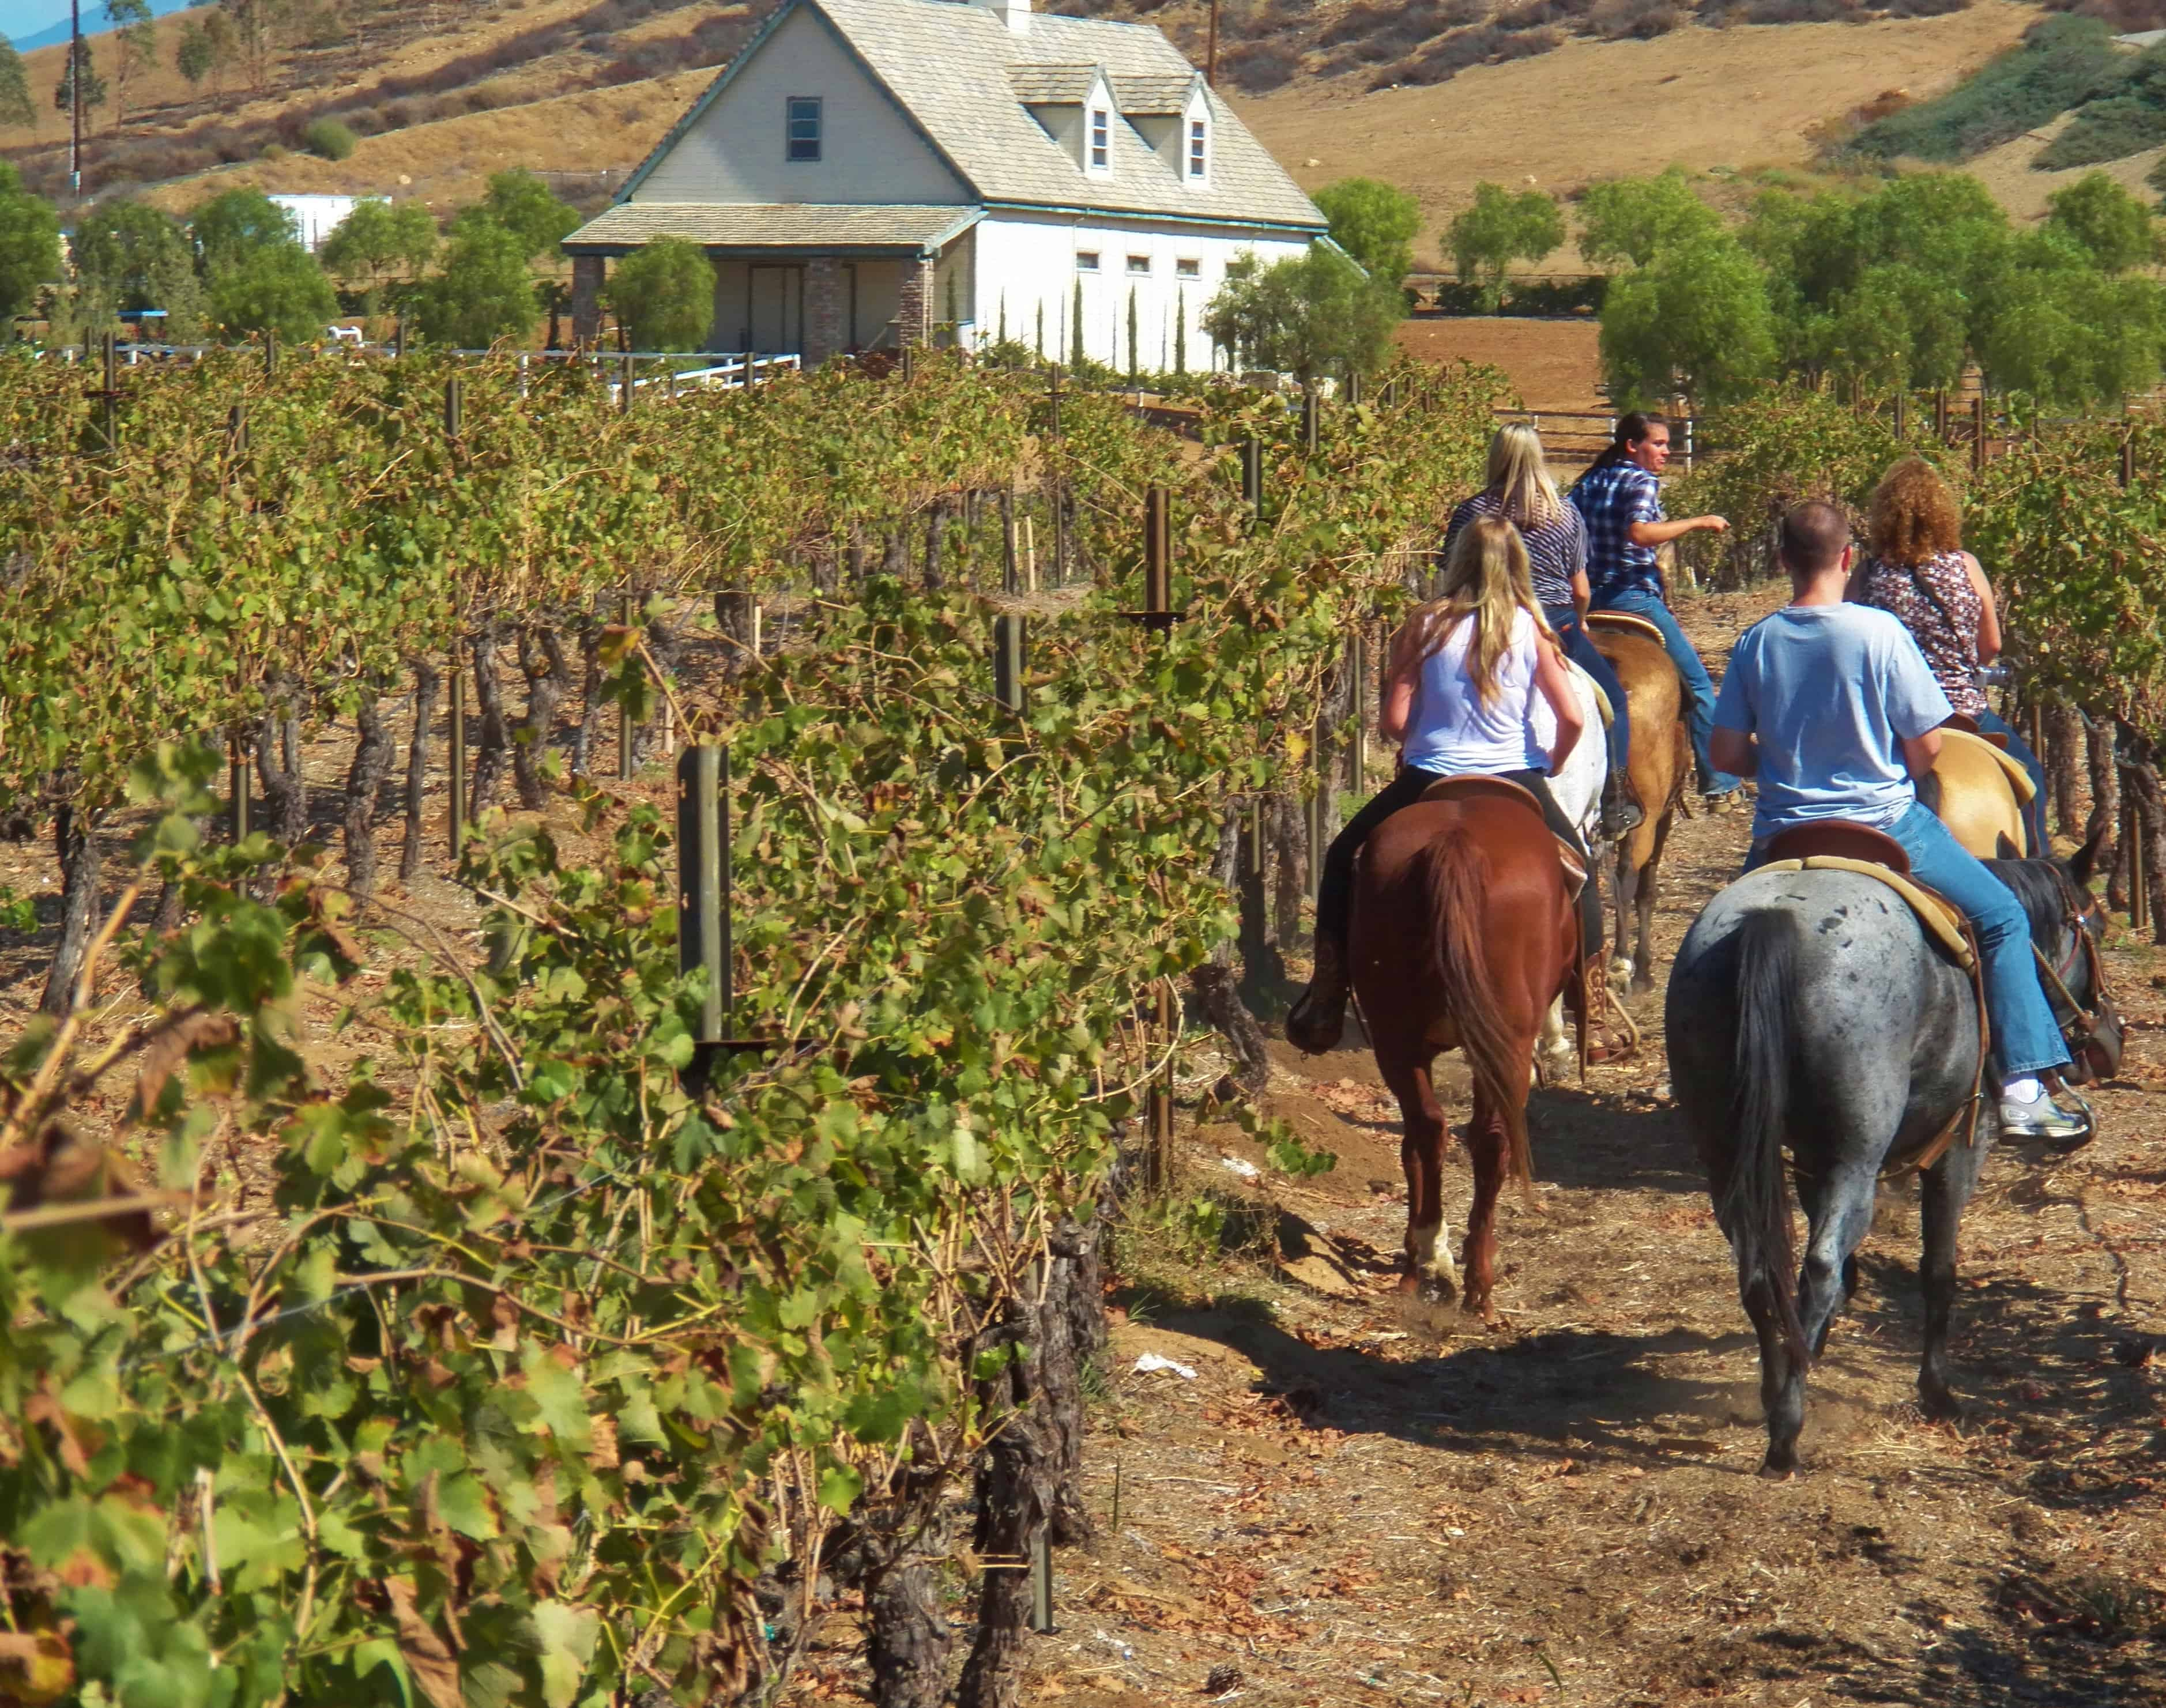 Horseback Riding Through the Temecula Vineyards